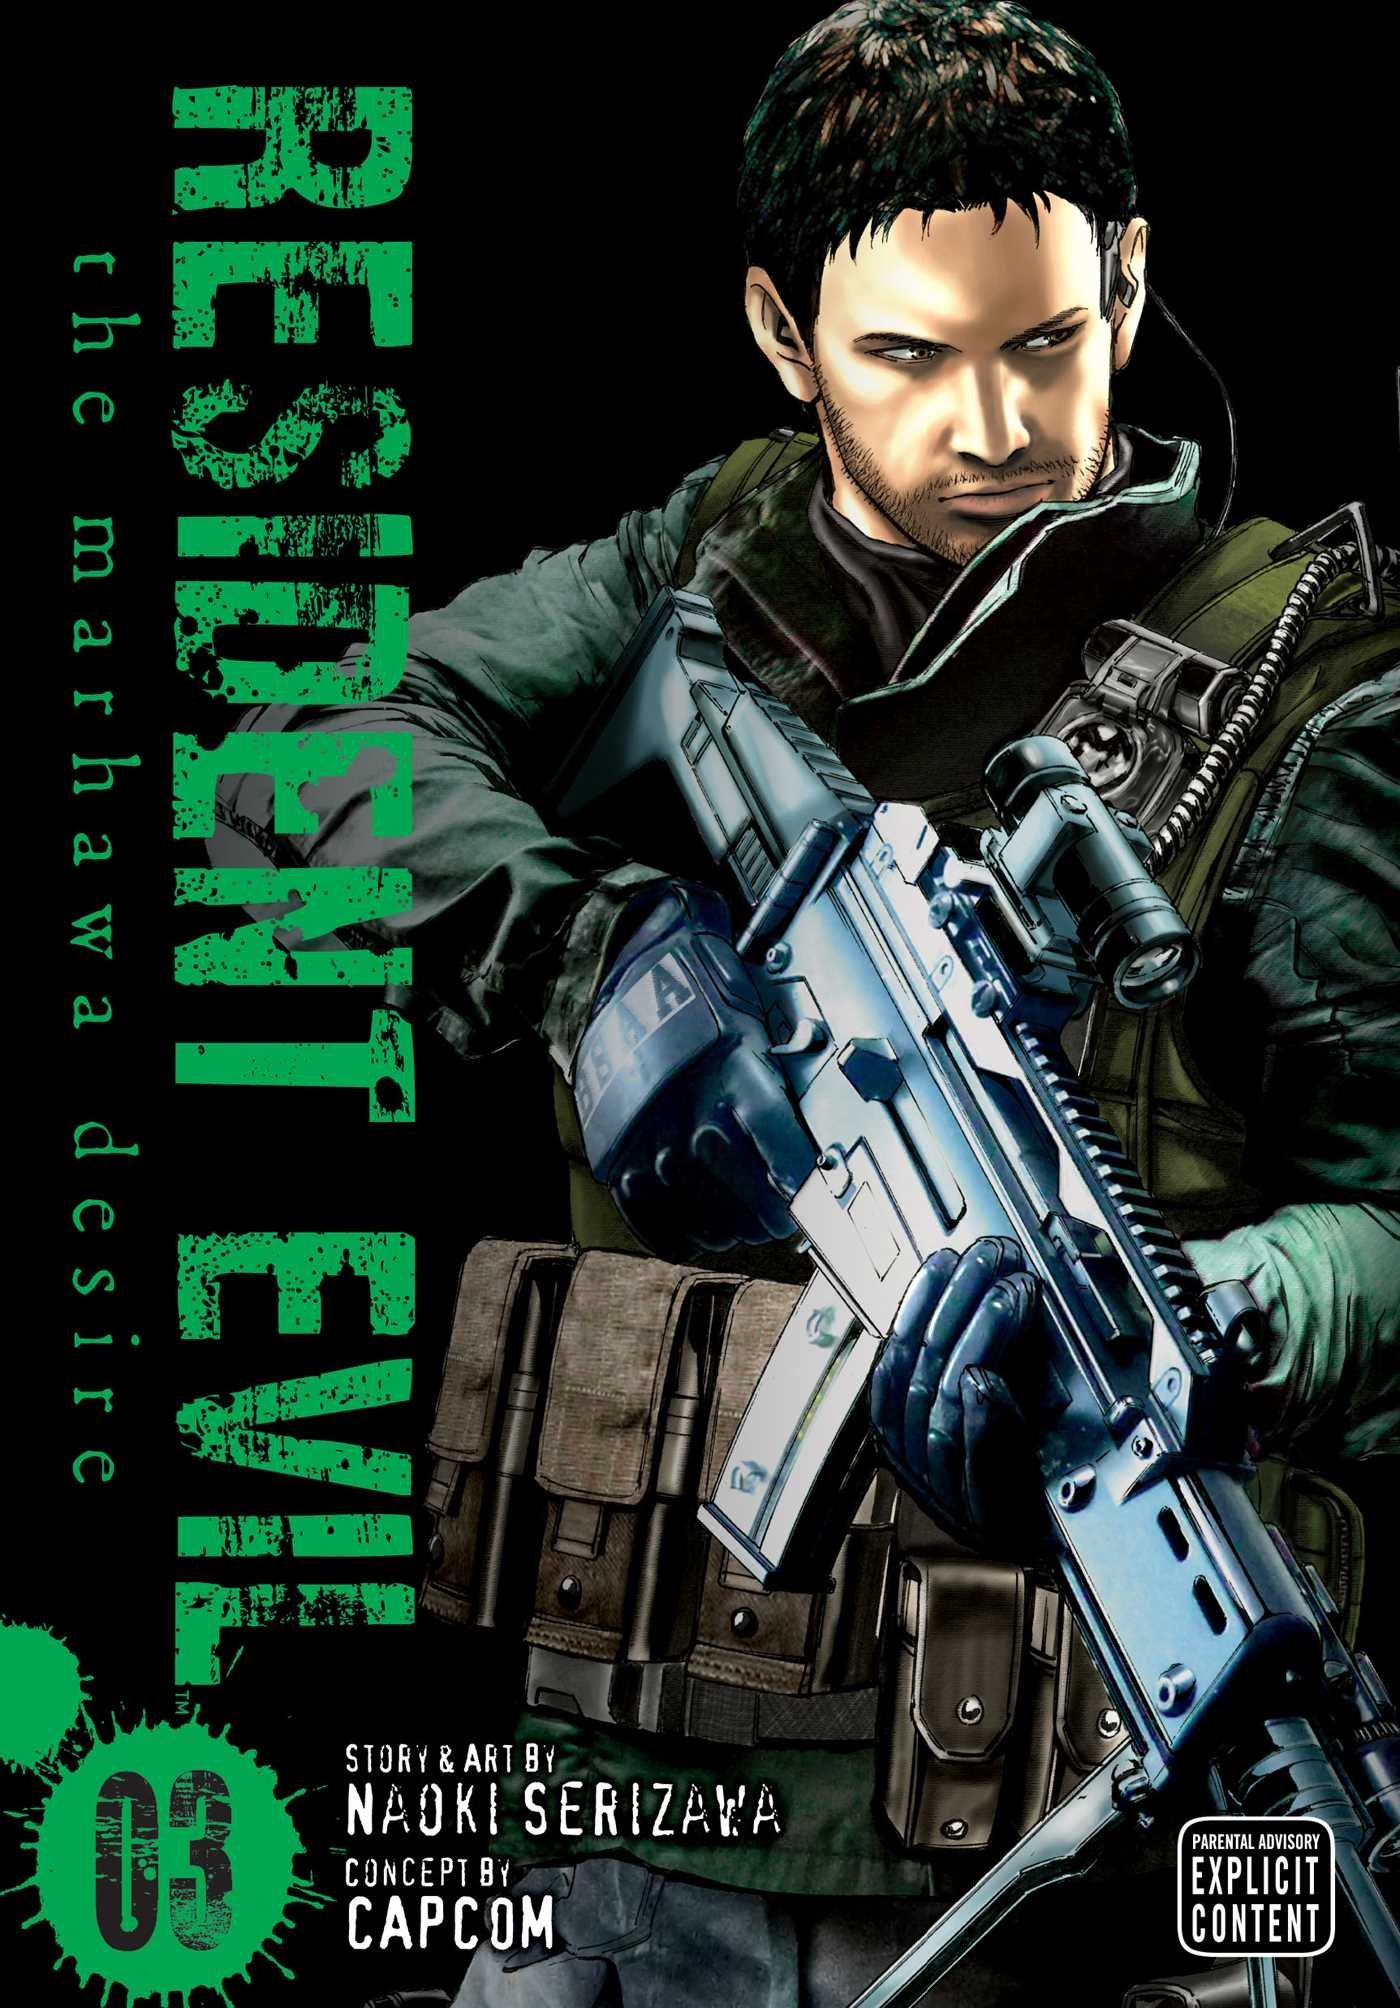 Resident Evil Biohazard Marhawa desire chapter 19: hết giờ trang 1